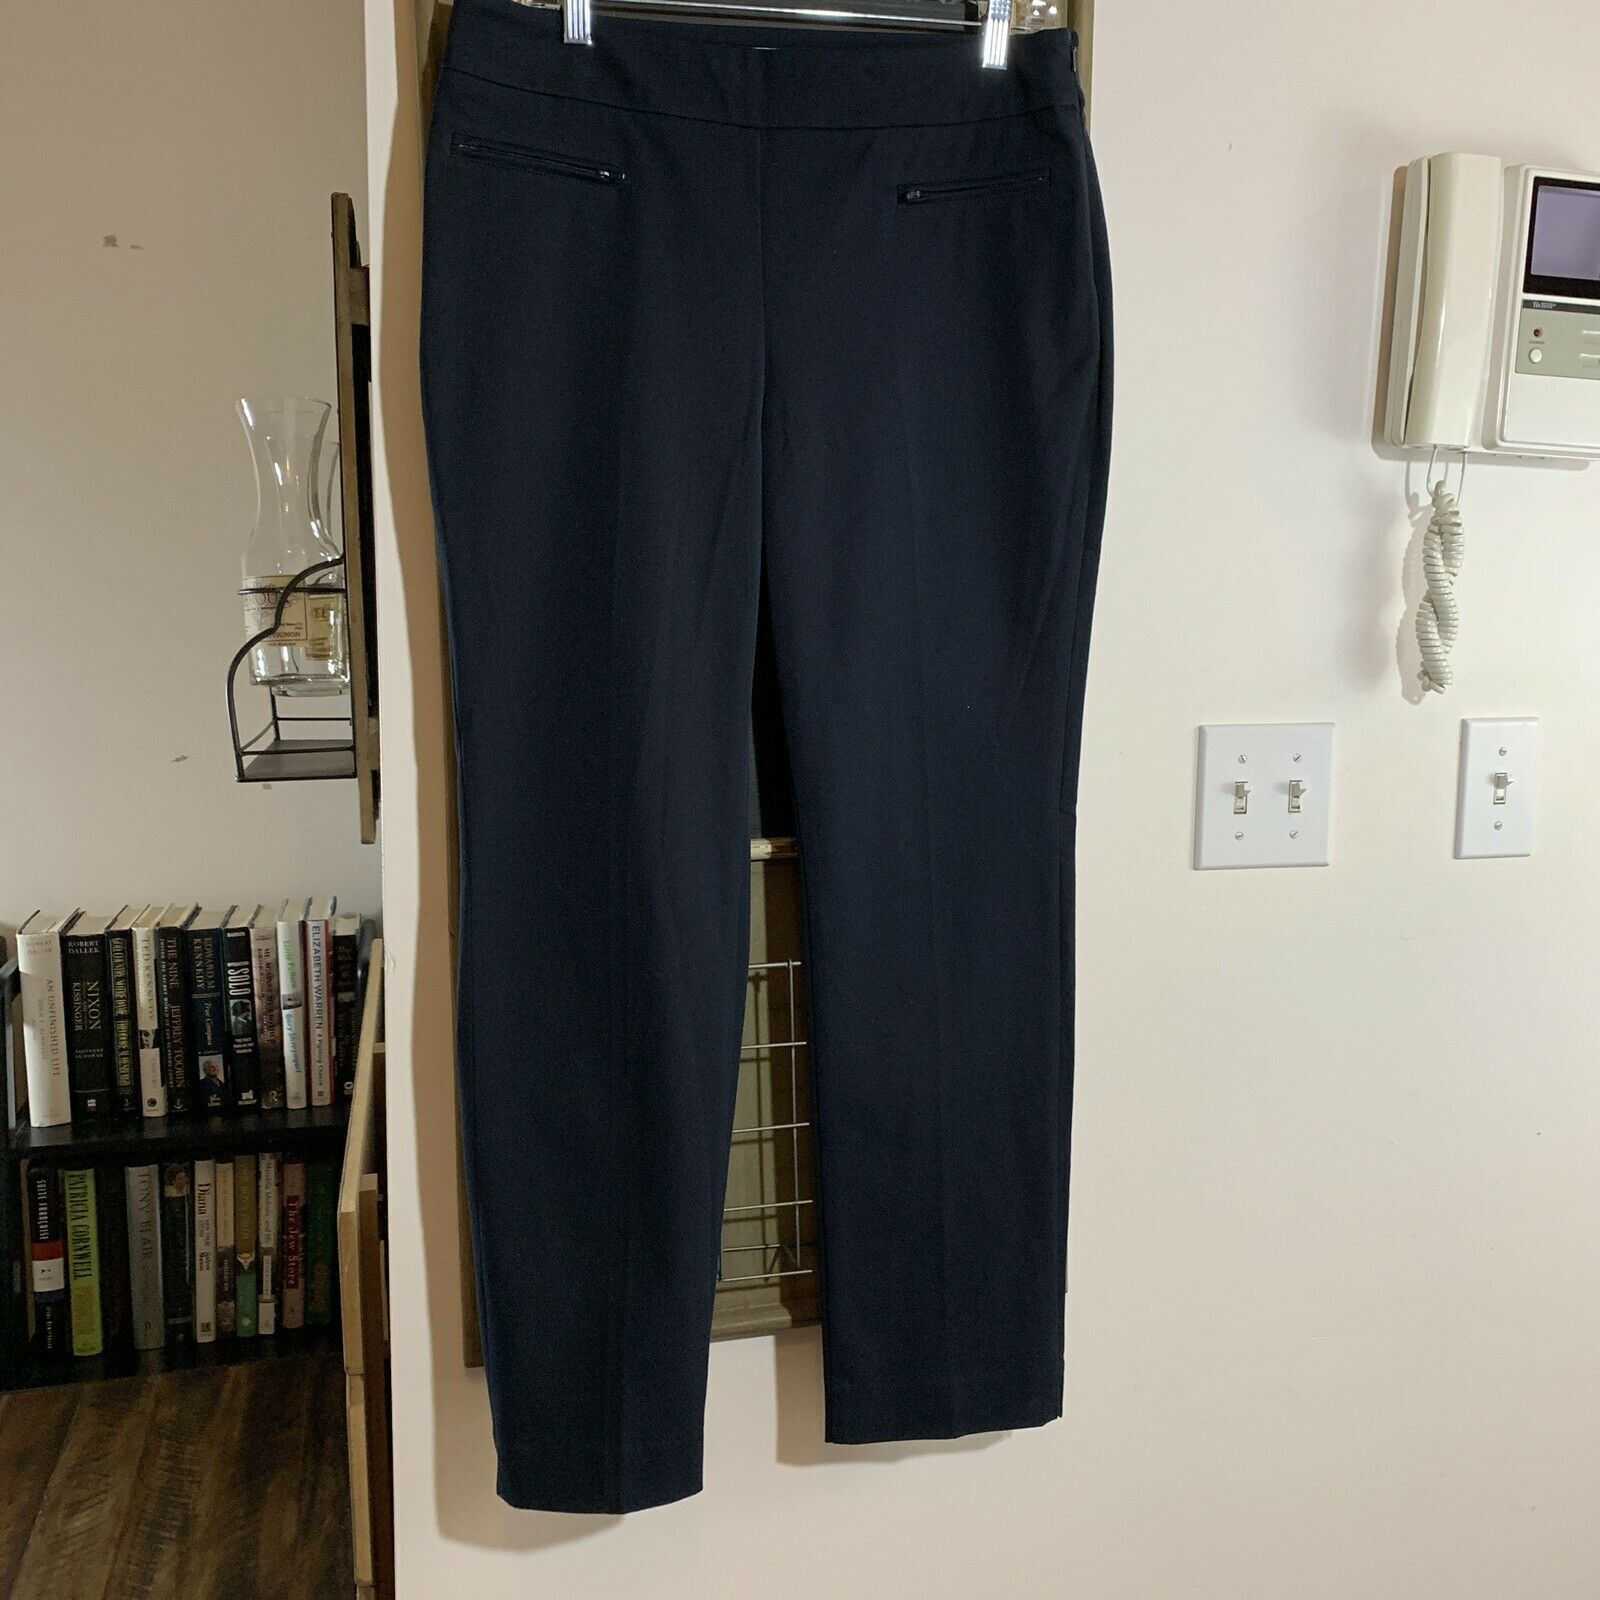 Talbots Petites Side Zip Slit Hem Straight Pants Size 10P